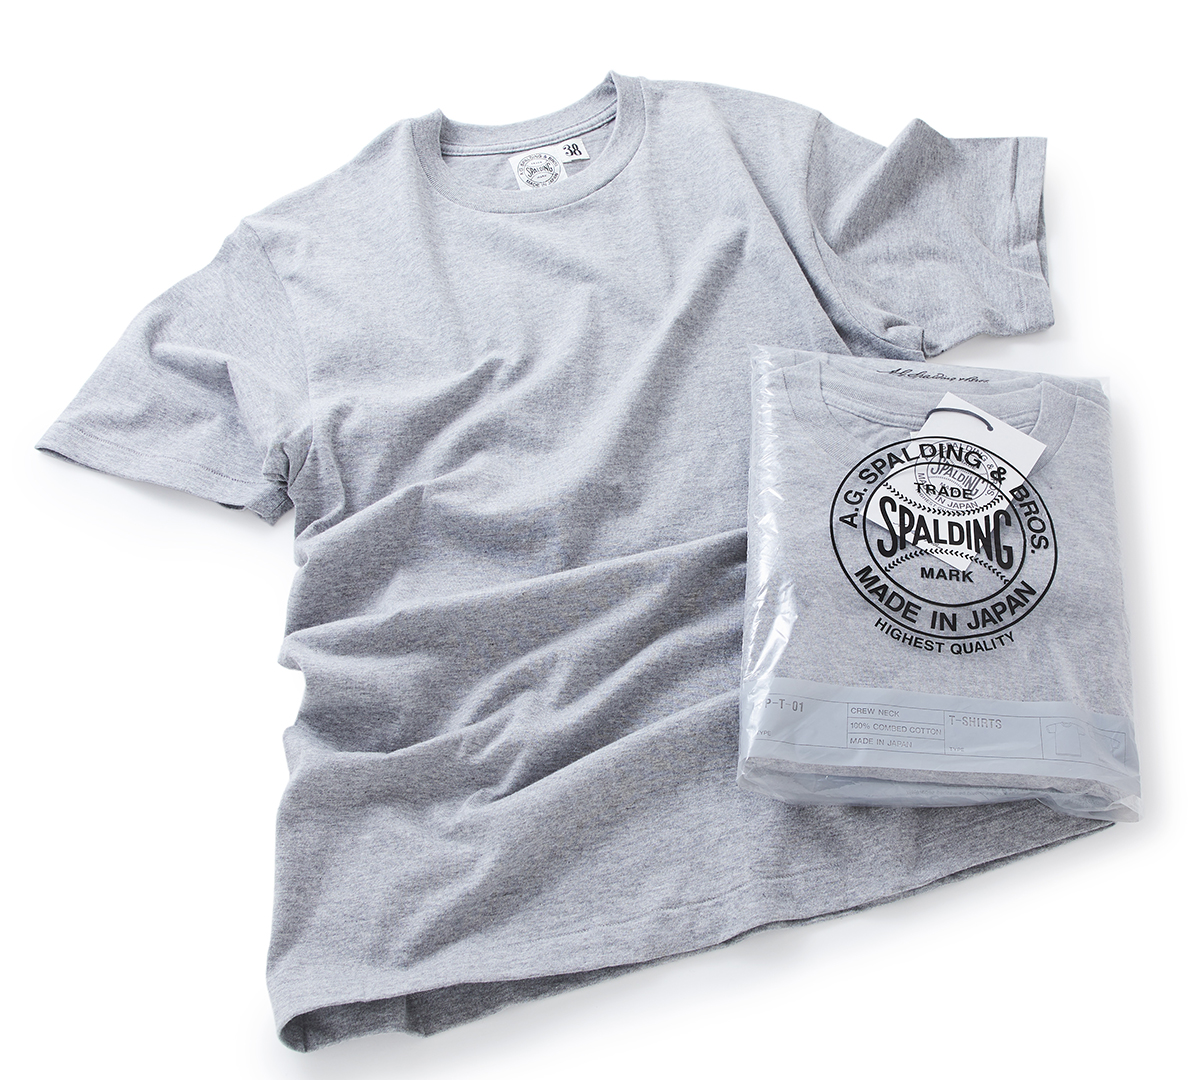 A.G. スポルディング社史初のパックTシャツ(2枚組)| A.G. Spalding & Bros.